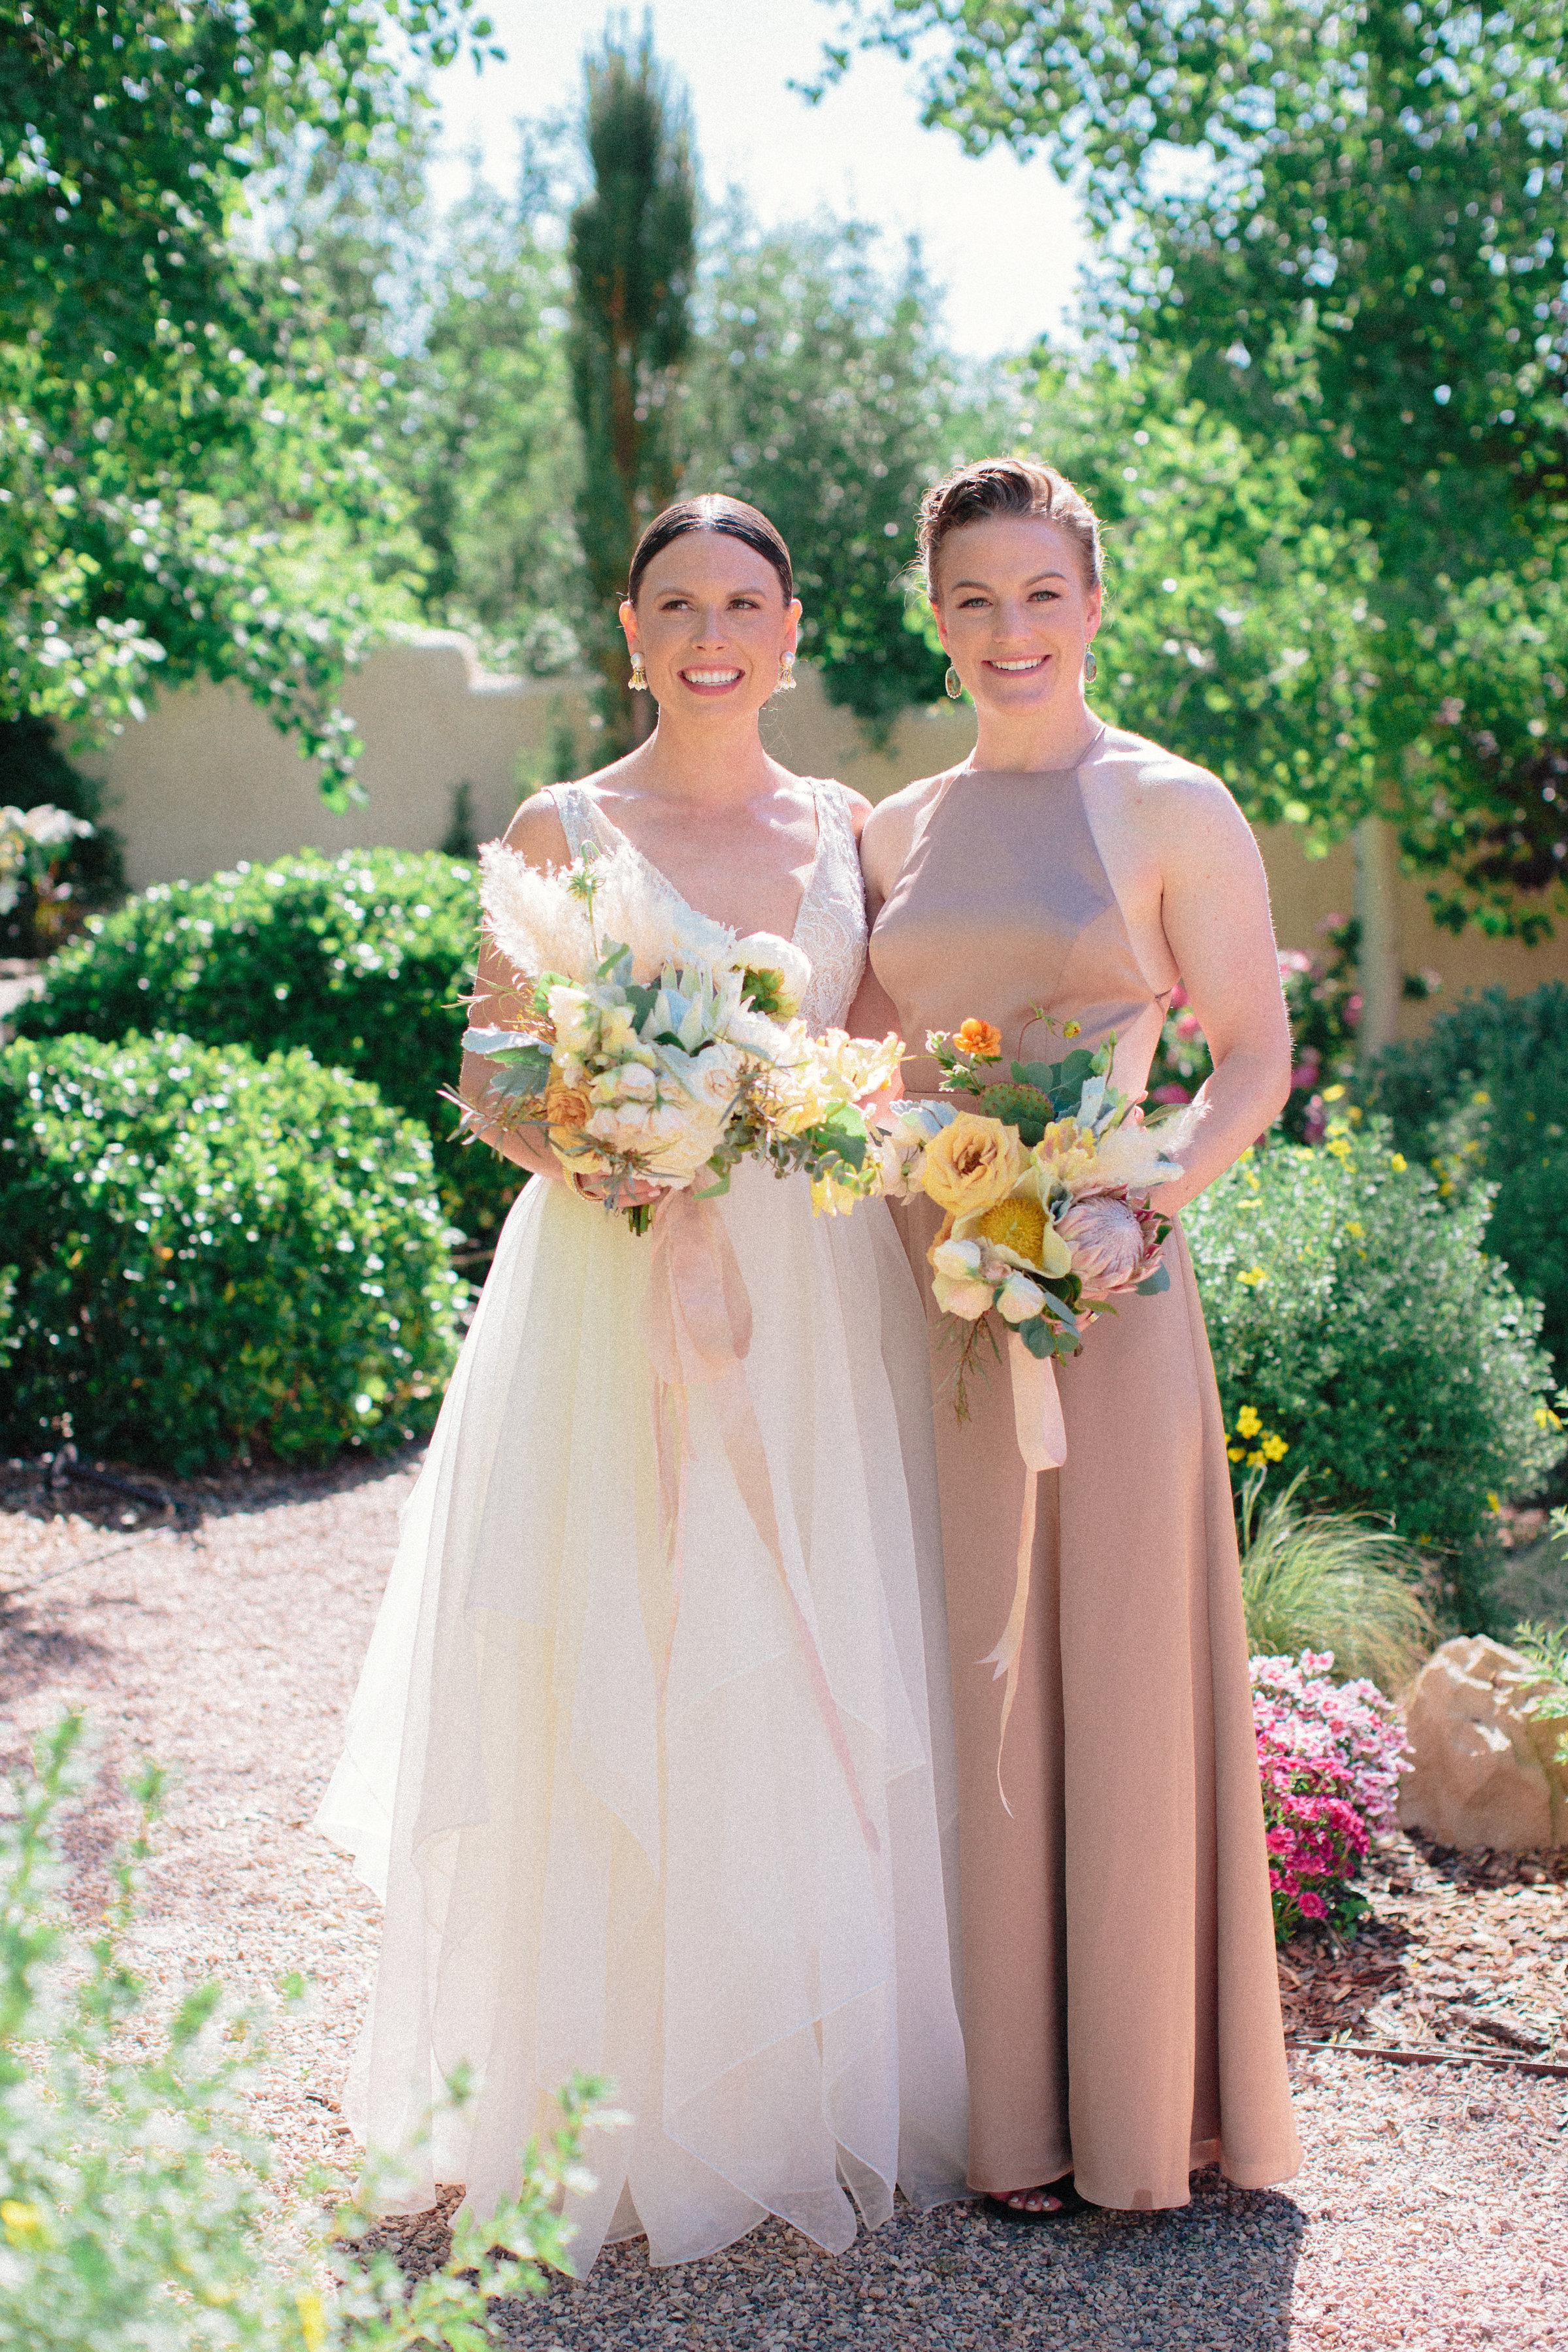 landry_lovelace_wedding_jbobephoto-260.jpg